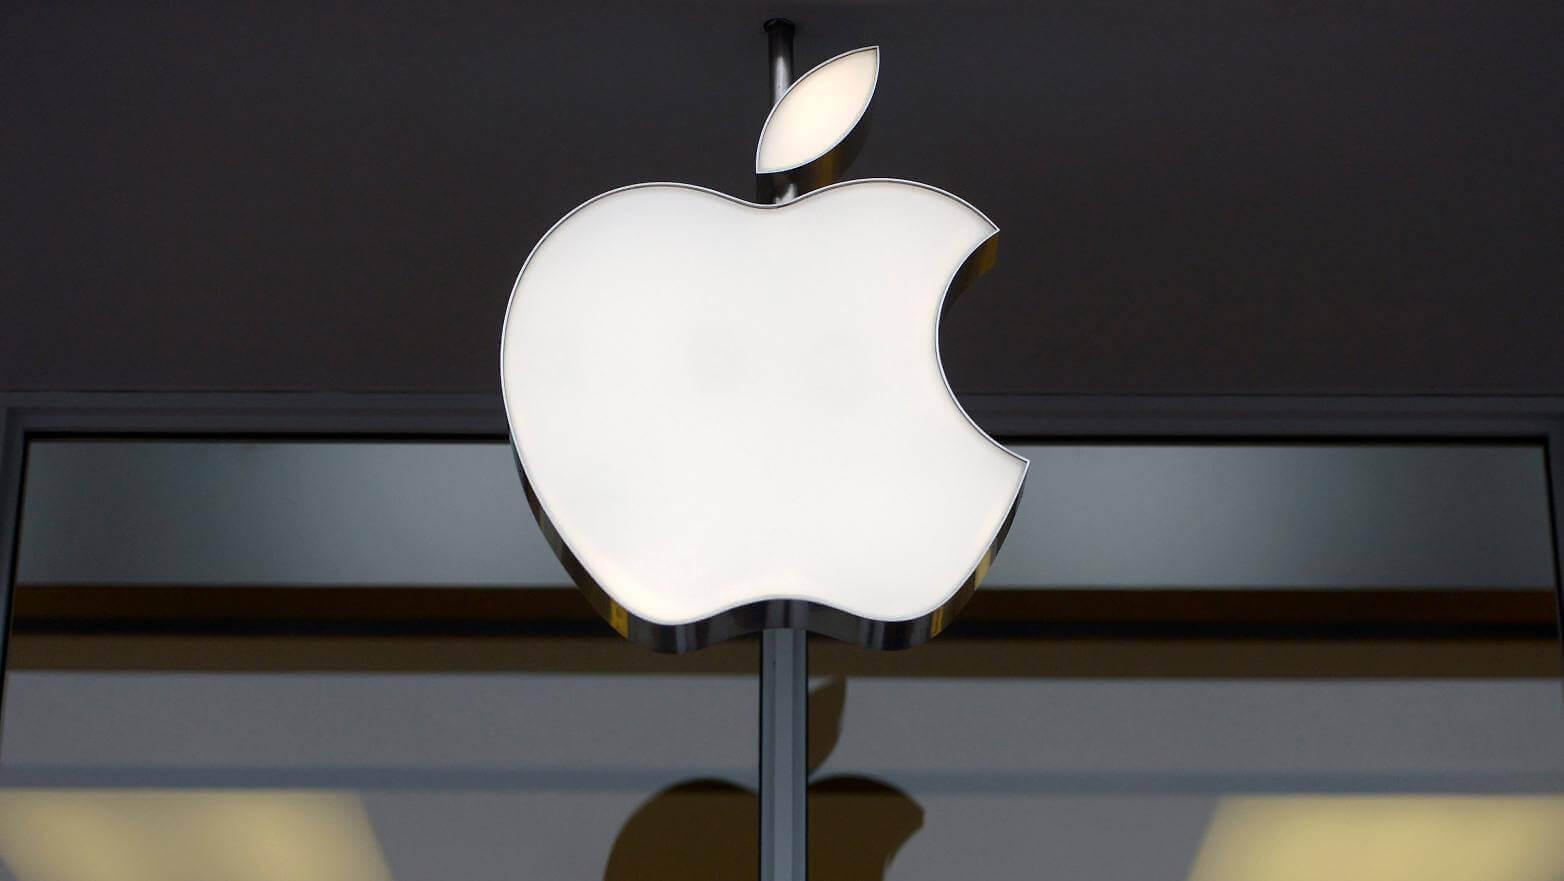 iOS Update 12.1.4 – FaceTime Bug